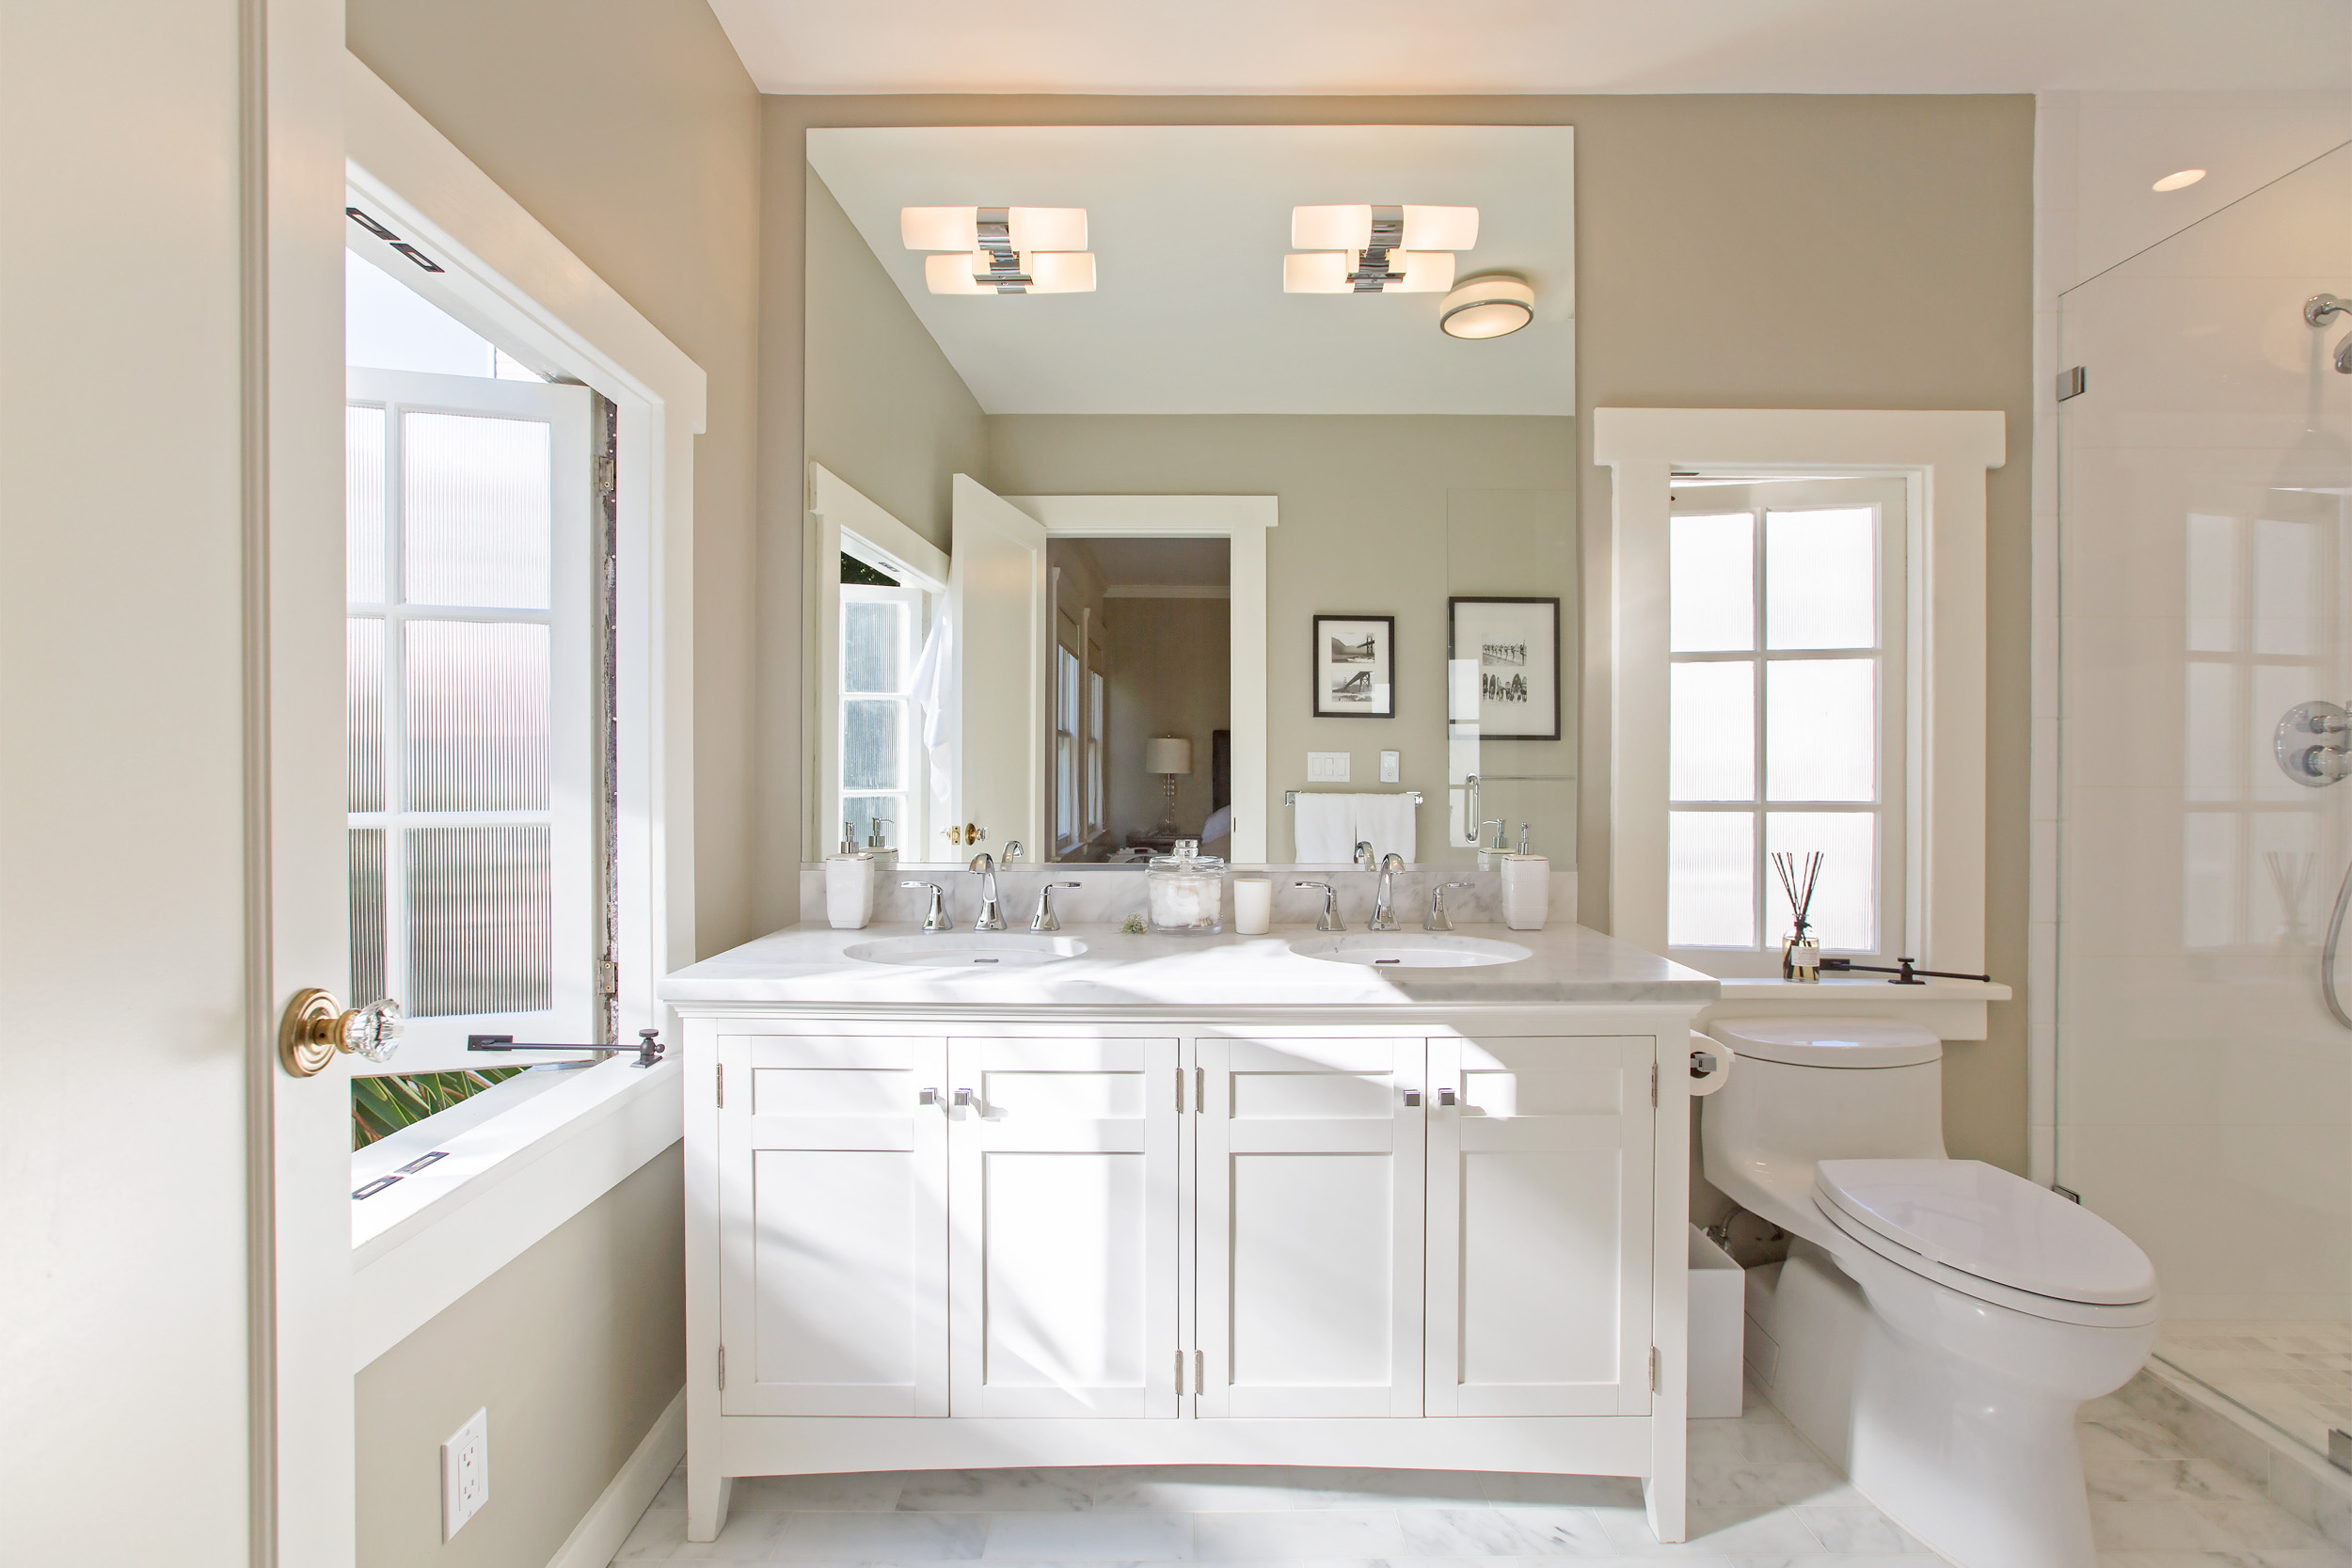 william-adams-design-cole-valley-white-bathroom-double-marble-vanity.jpg